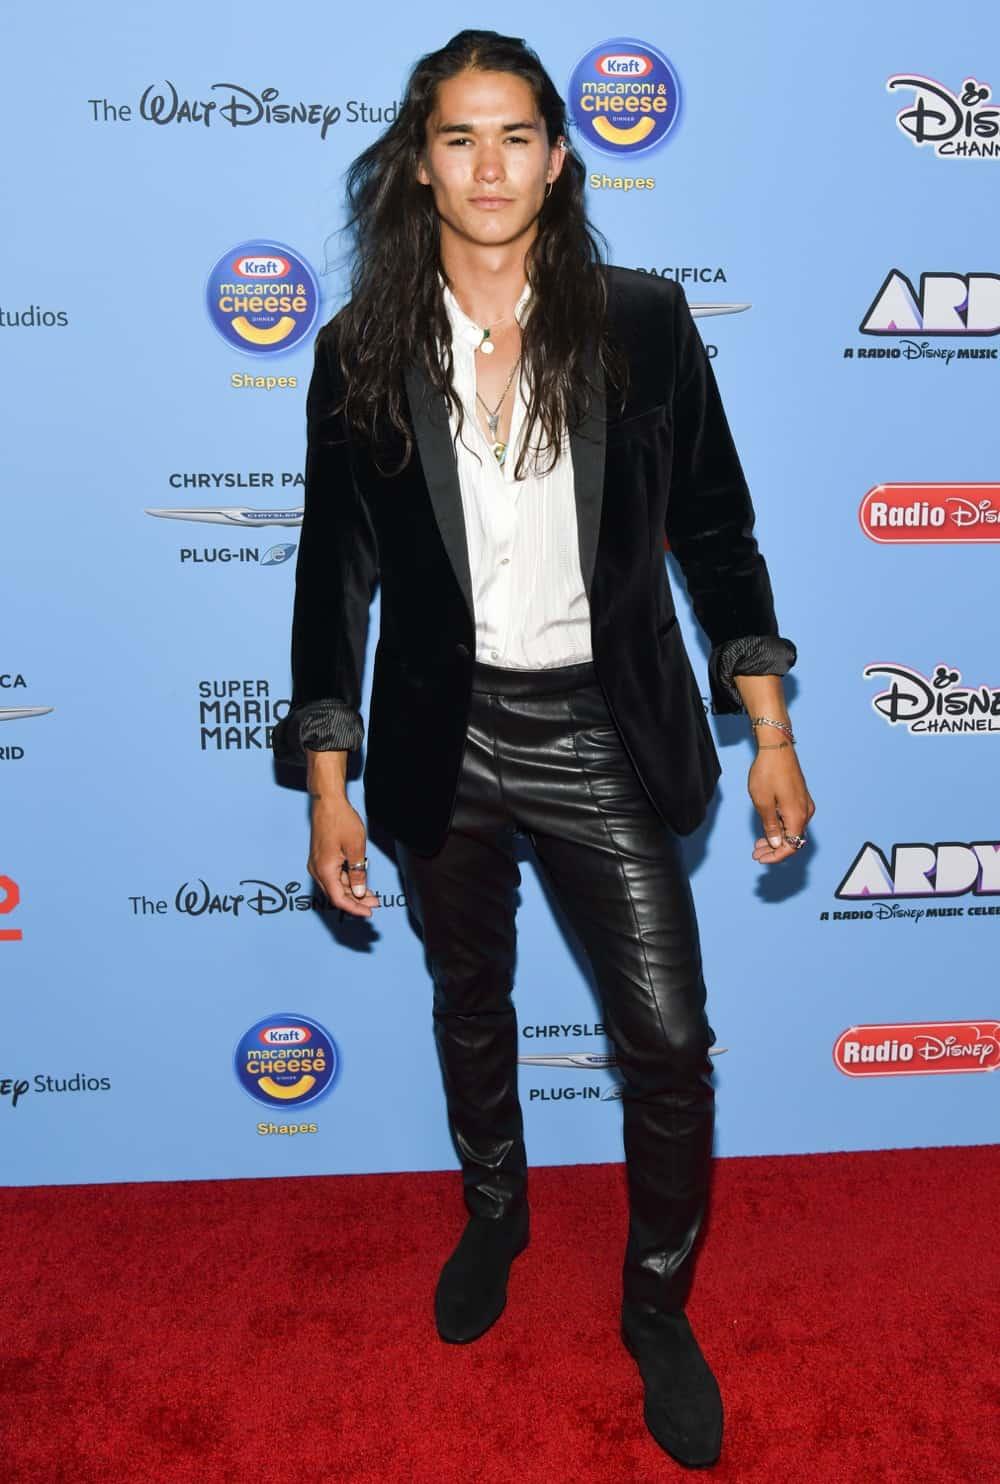 2019 Radio Disney Music Awards - Arrivals